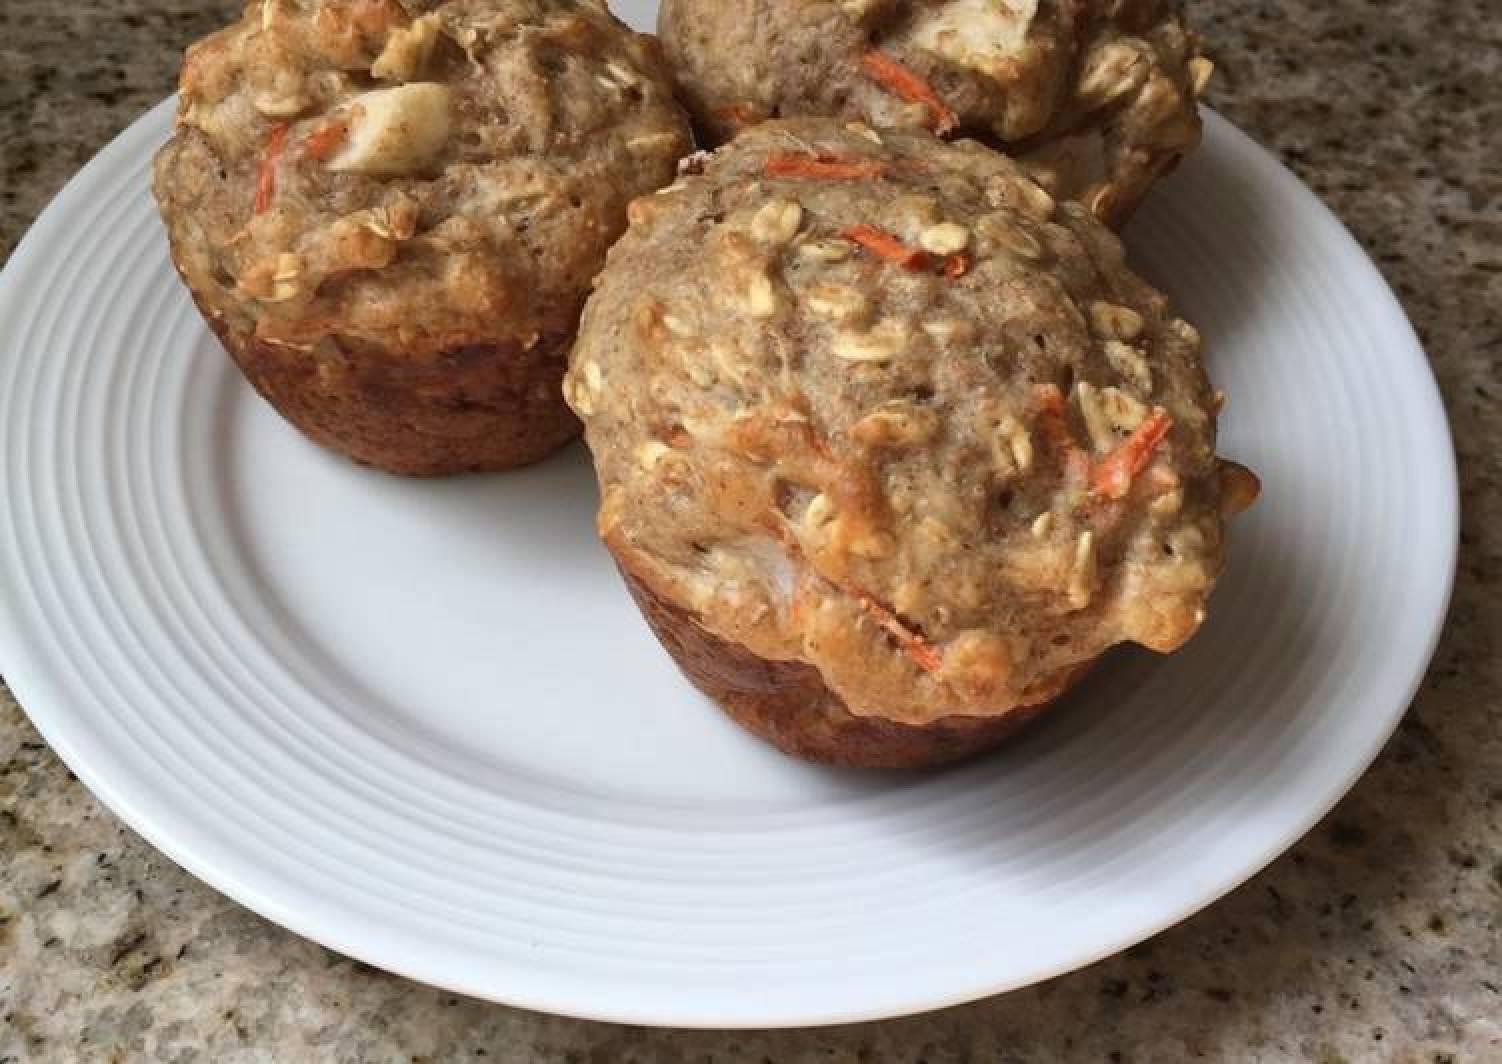 Apple carrot oat muffin